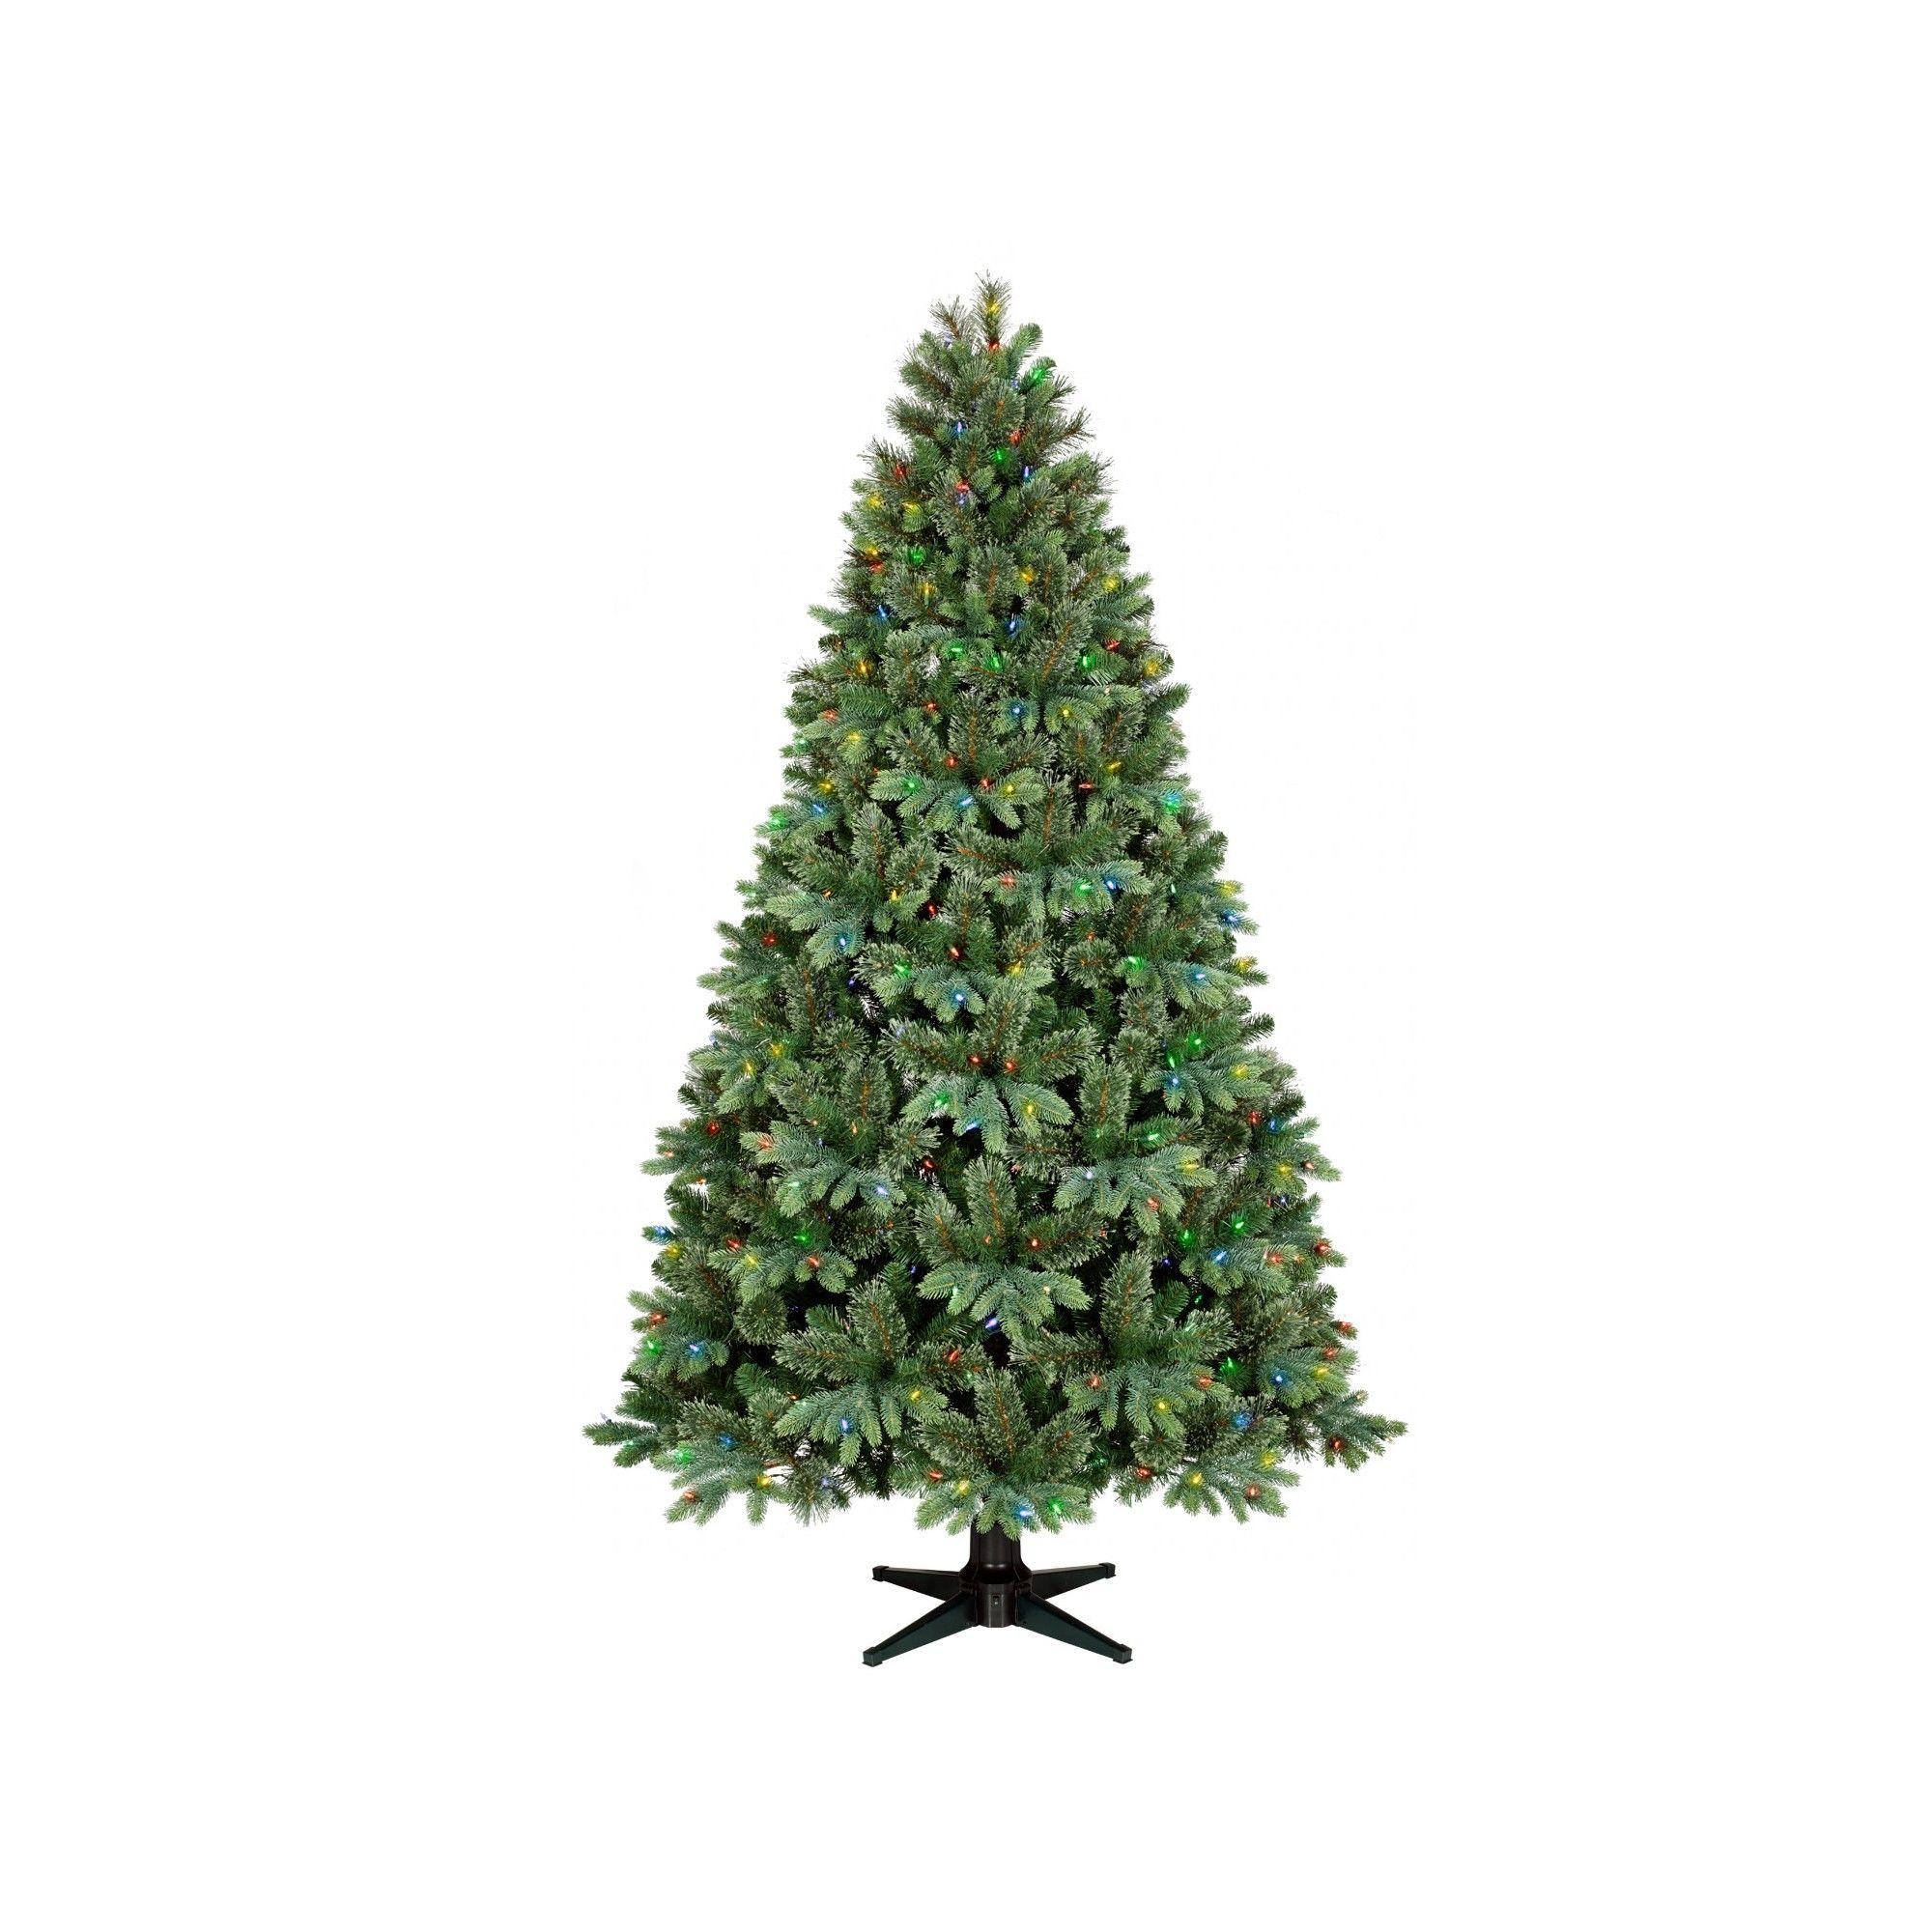 Philips Led Christmas Tree: Philips 7.5' Prelit Artificial Christmas Tree Balsam Fir